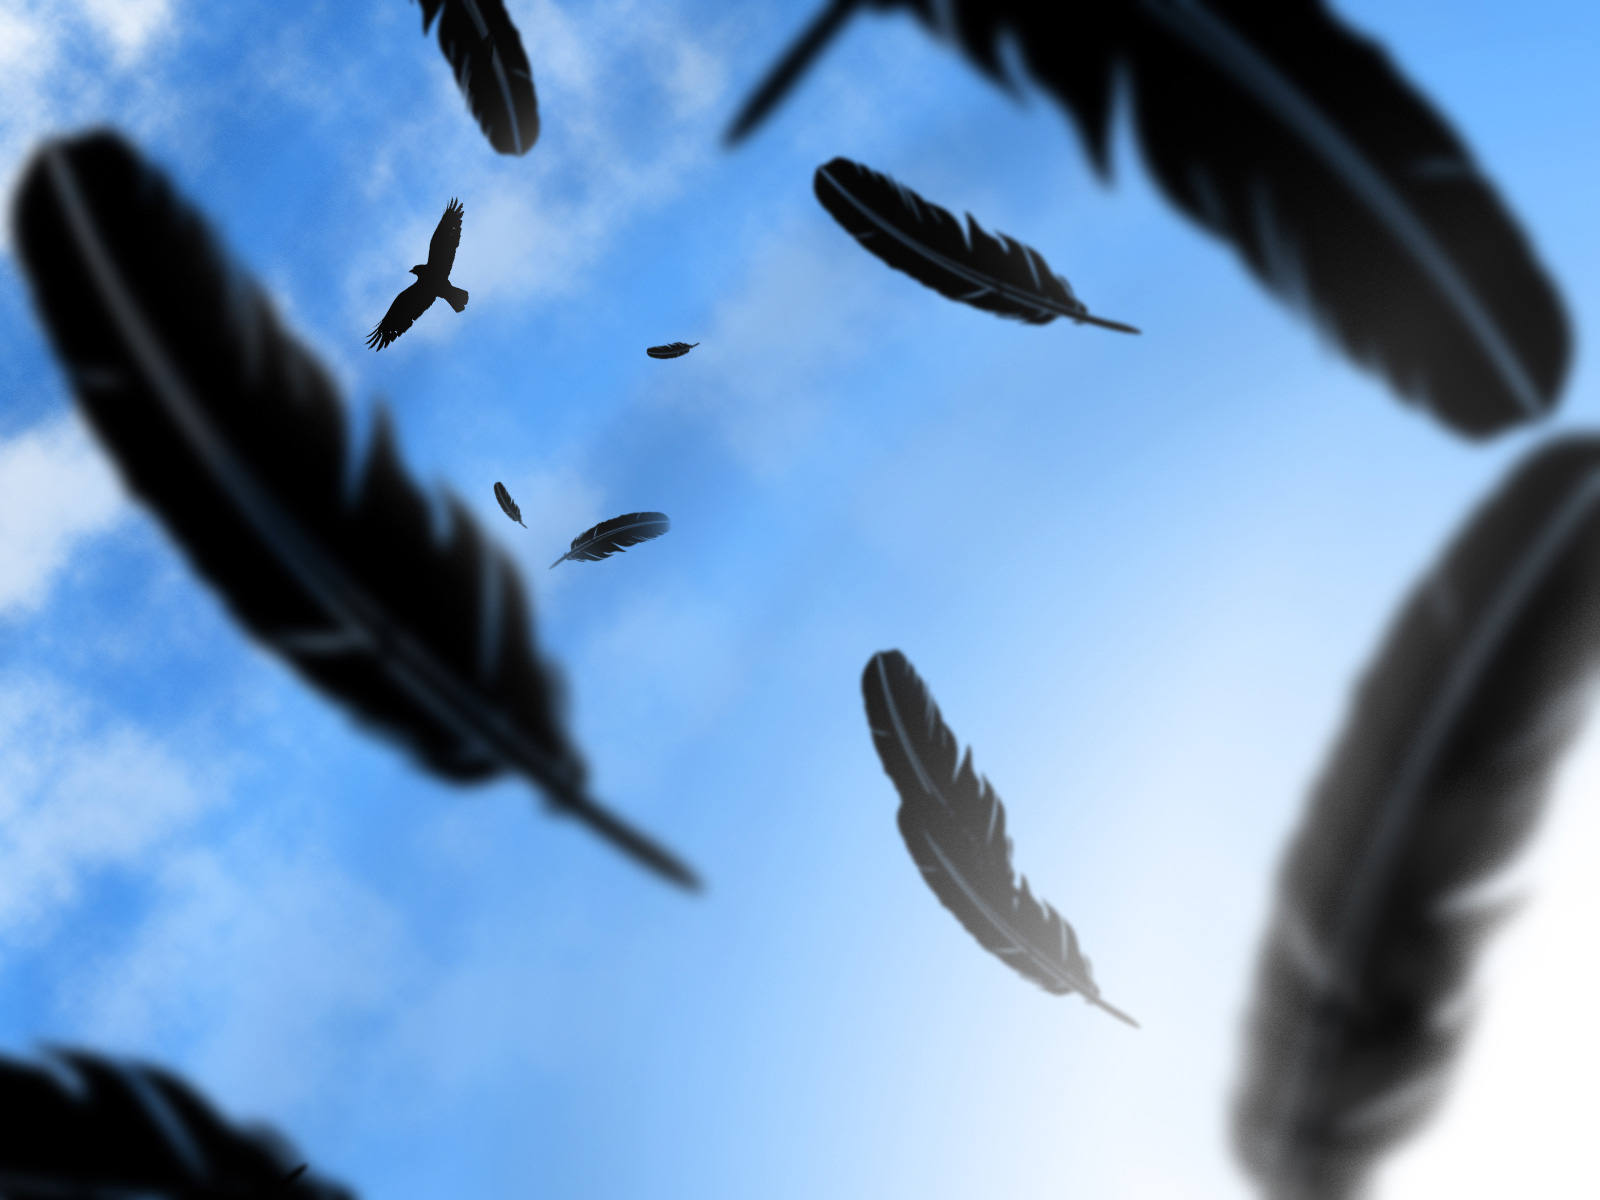 Falling Feathers Wallpaper Crow Computer Wallpapers Desktop Backgrounds 1600x1200